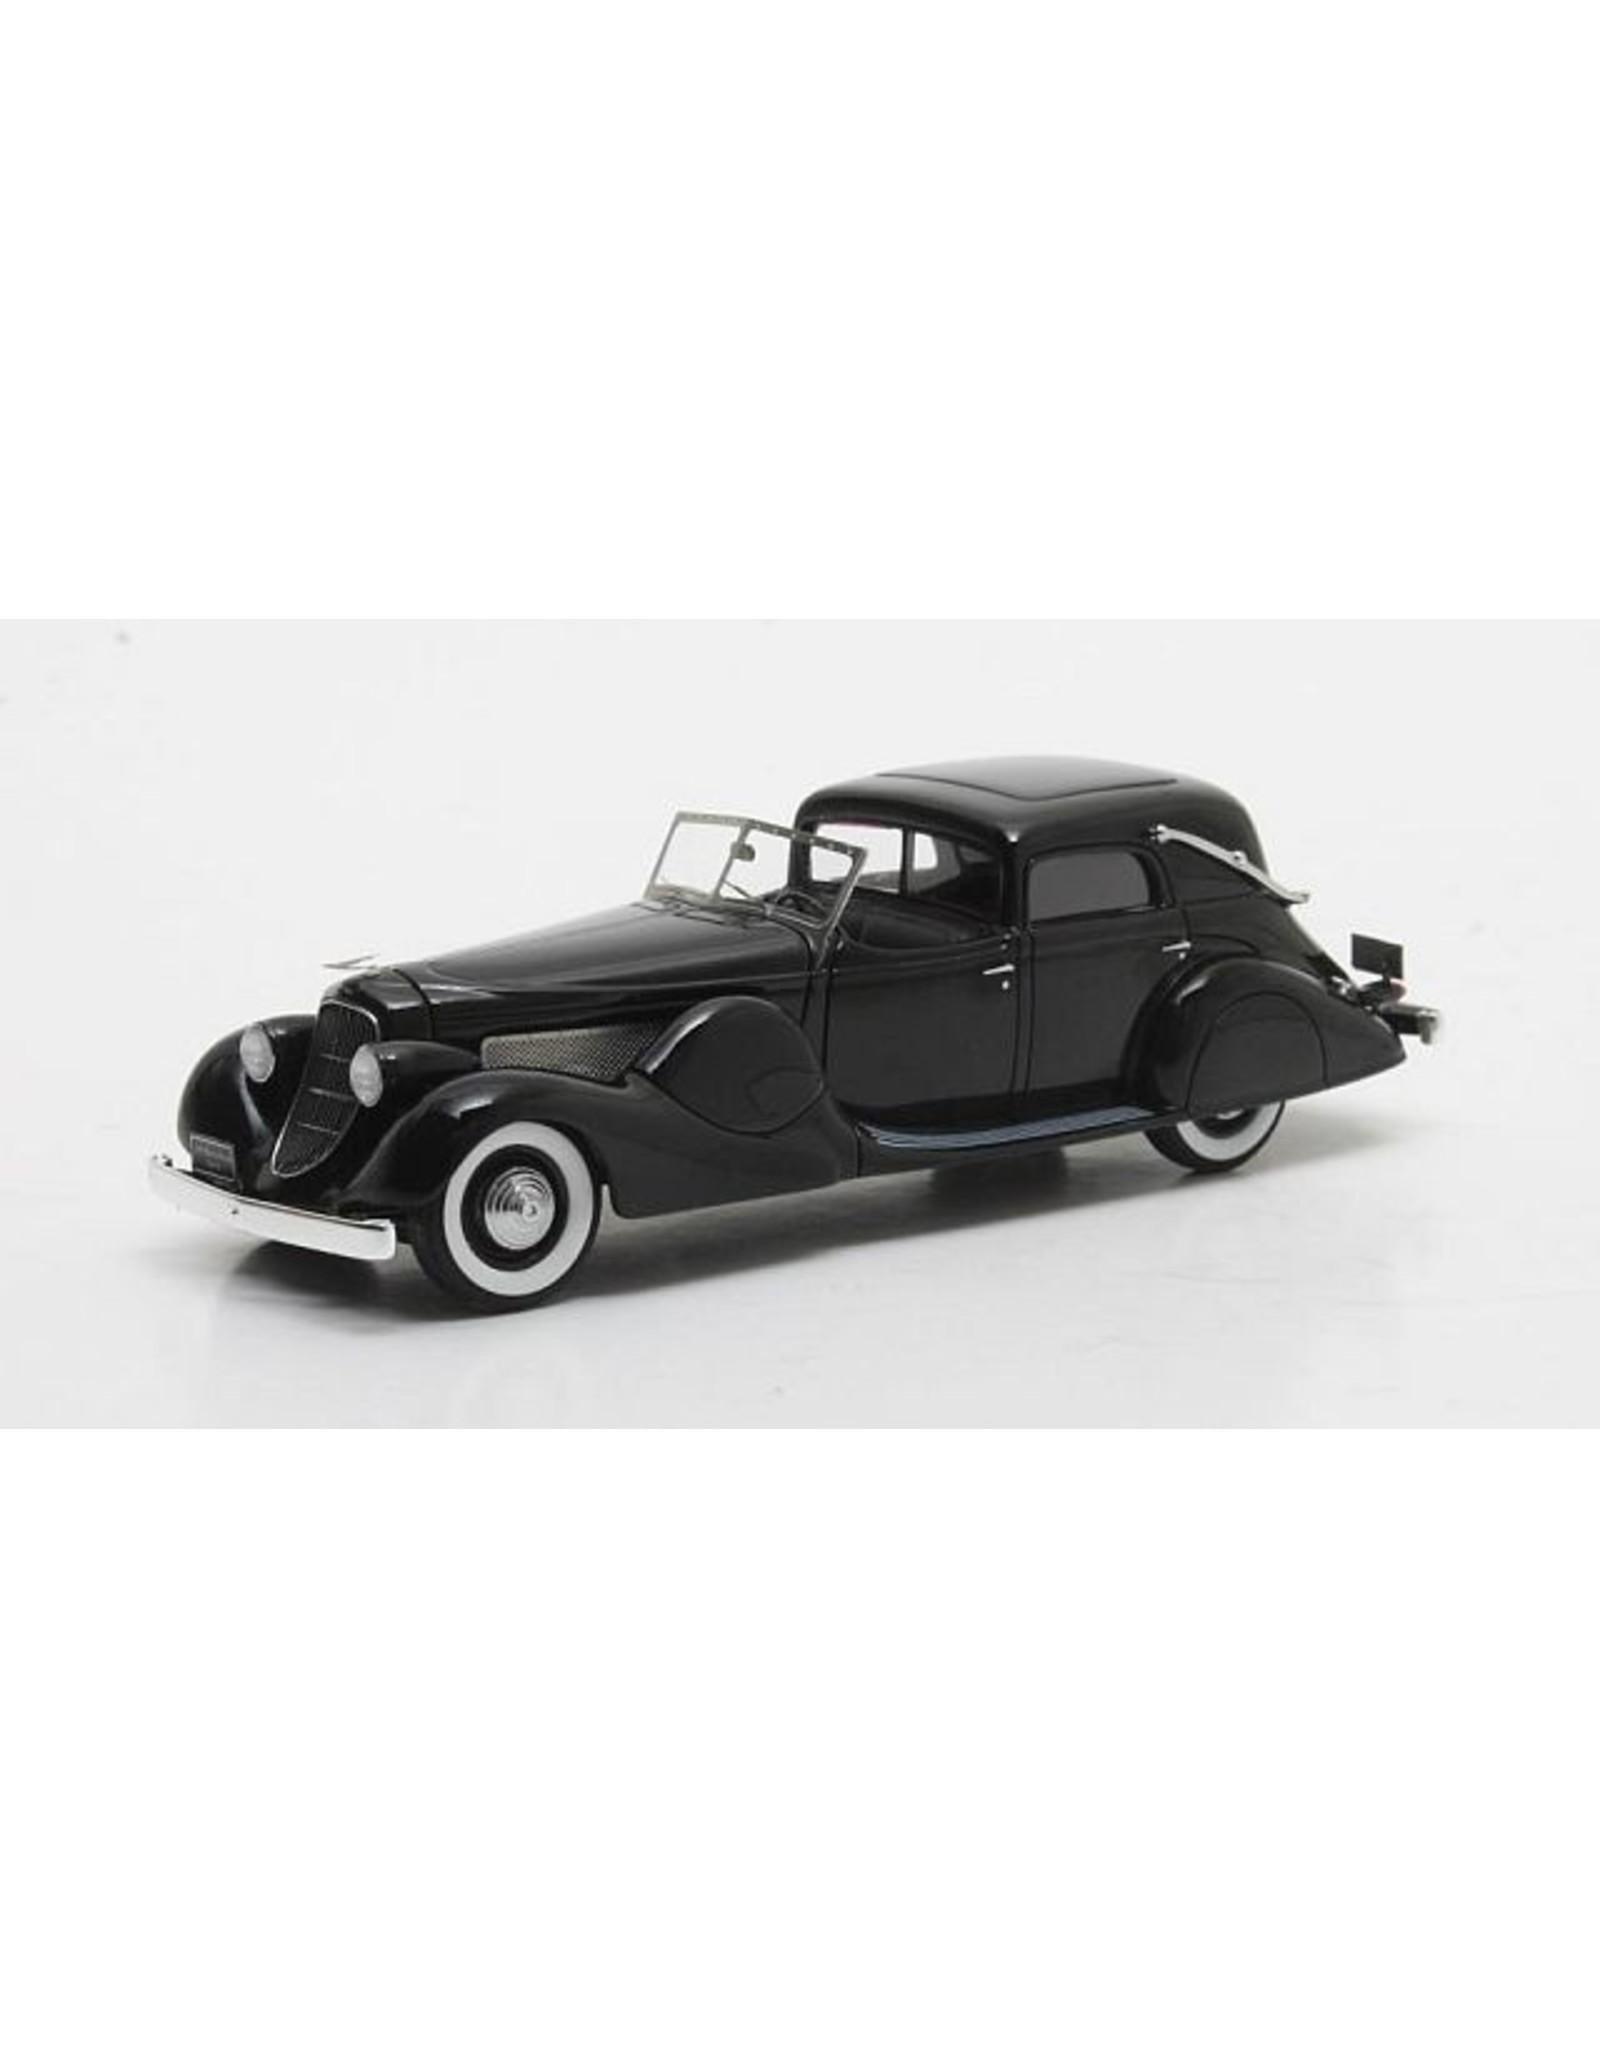 Duesenberg by Bohman & Schwartz DUESENBERG SJ533-2582 TOWN CAR LWB BOHMAN & SCHWARTZ-1935(black)